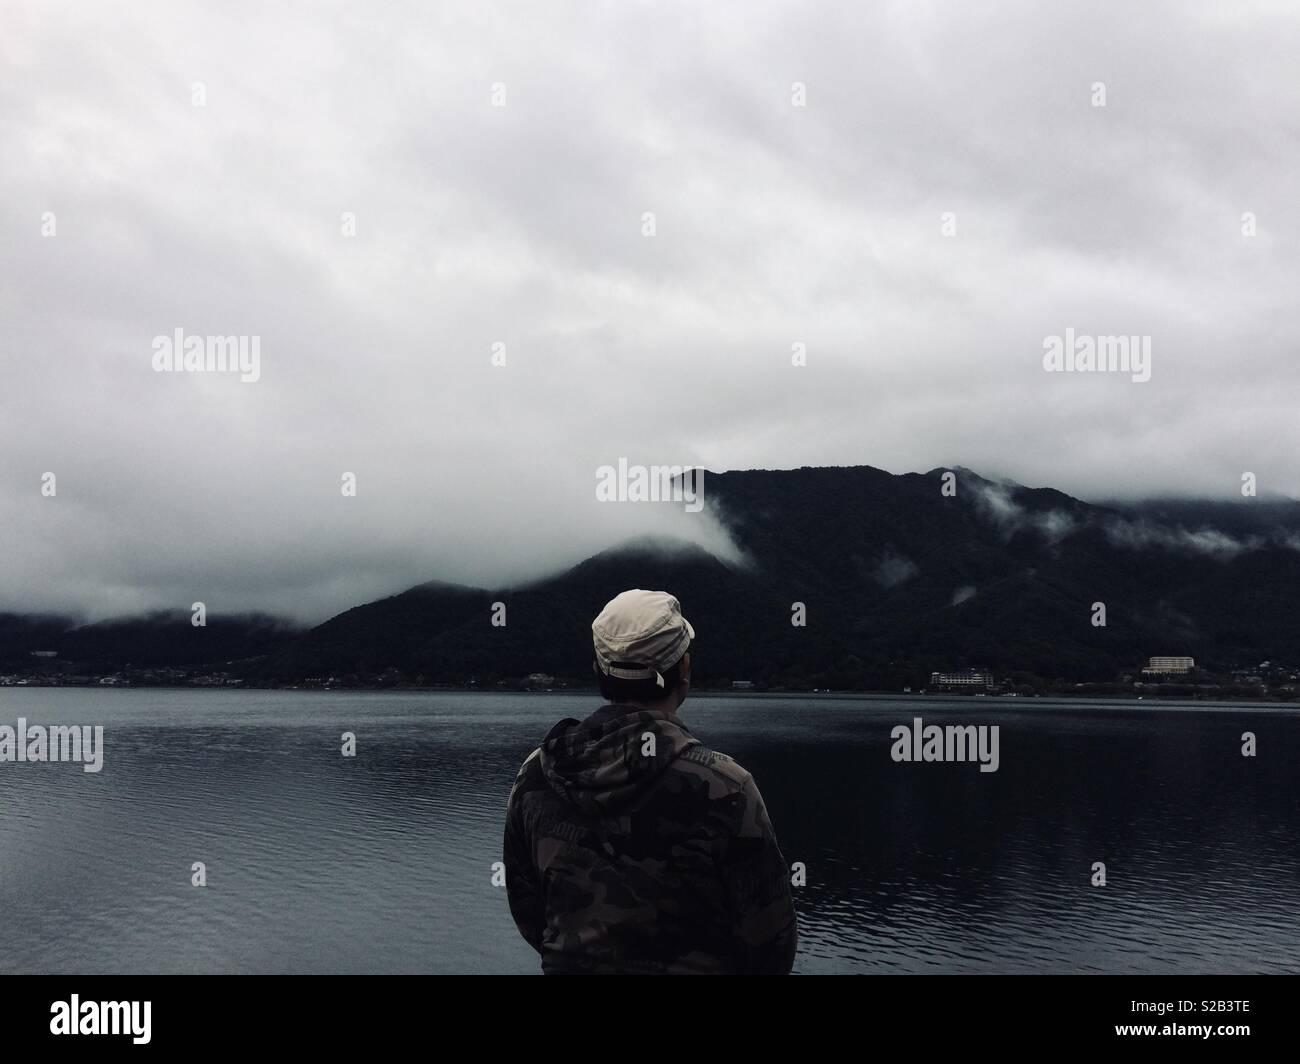 Regardant le lac Kawaguchi Photo Stock